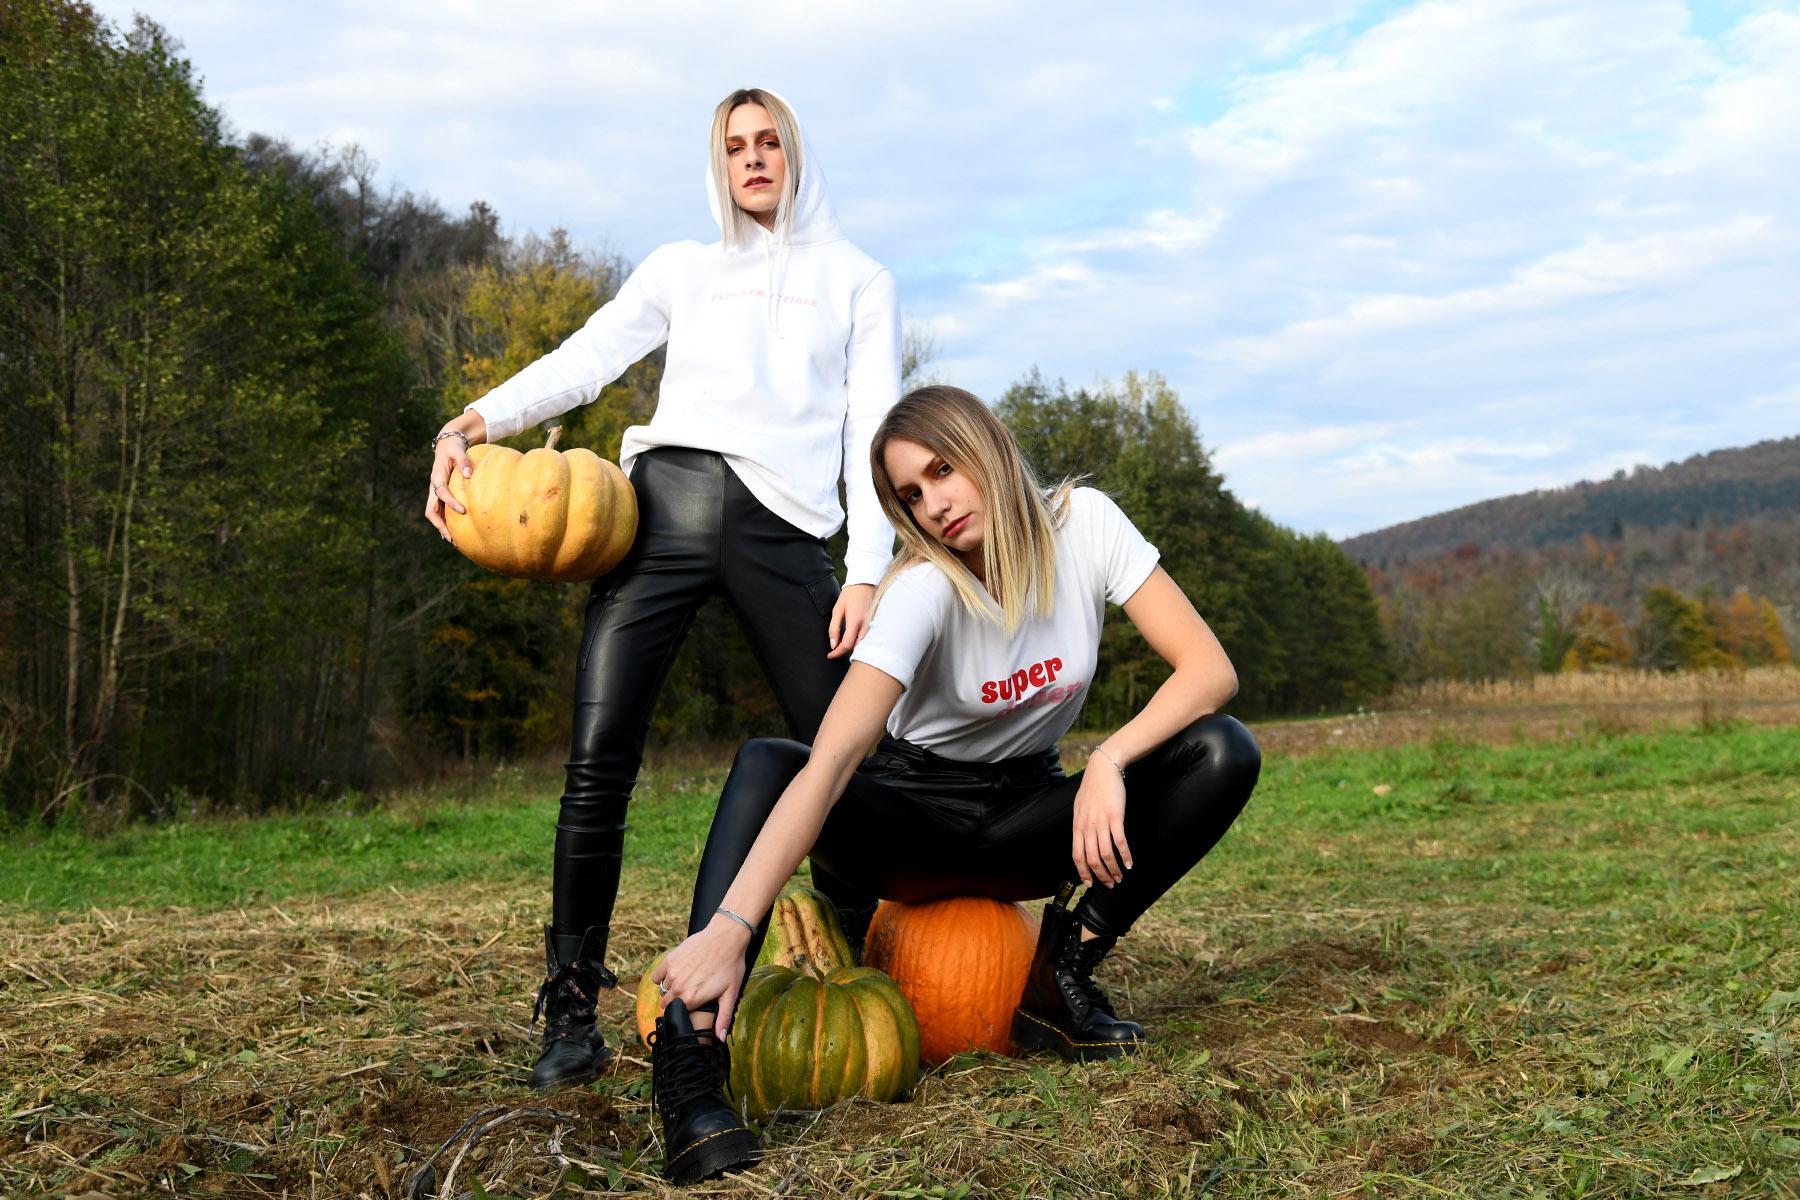 Extravagant editorijal: Hoodies, pumpkins and more...